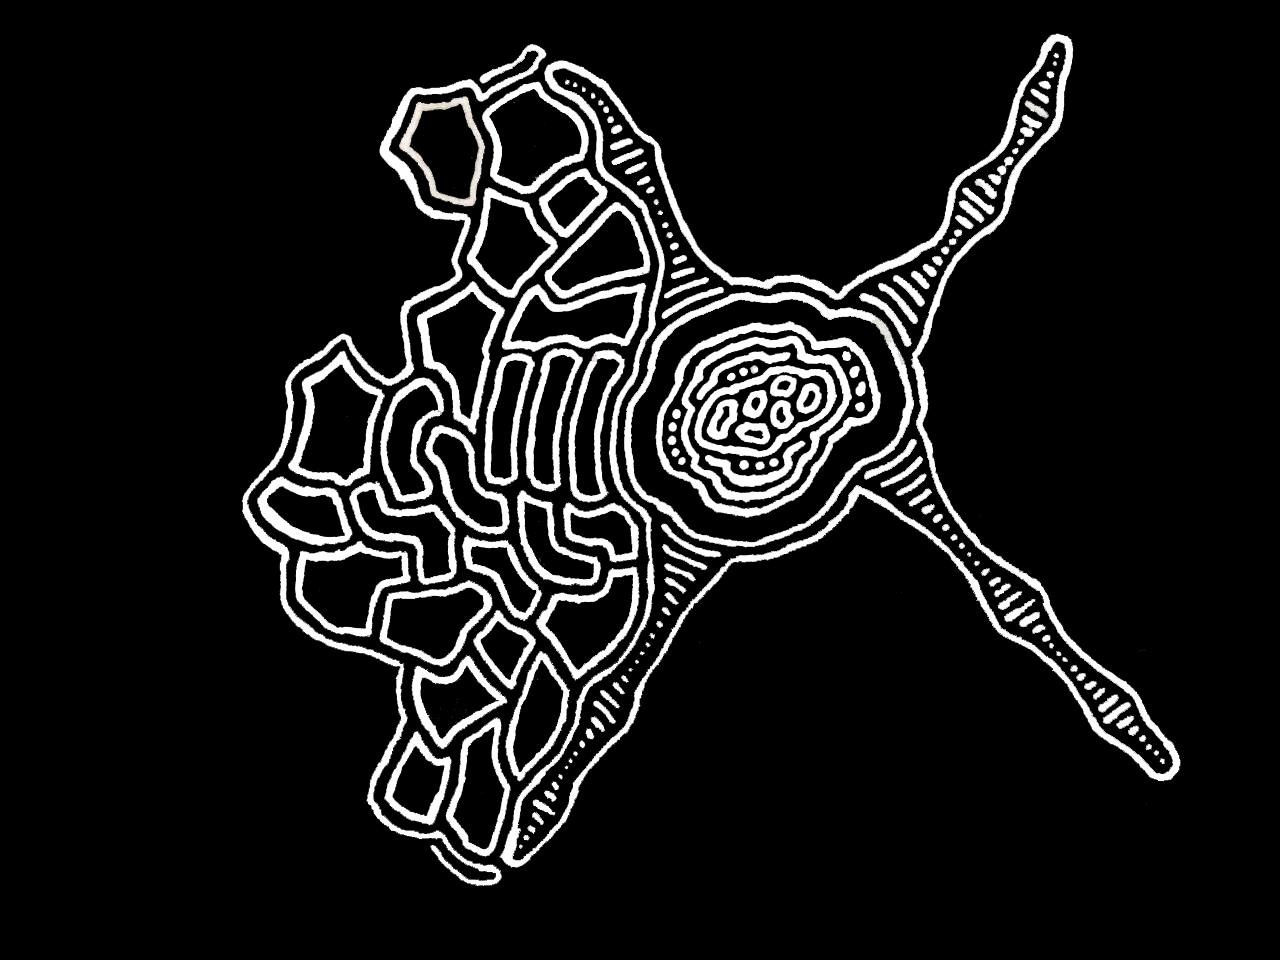 Aleksei Dovhan Artwork 2020-09-06 Rhythm of the heart (size - A4, style - zentangle)